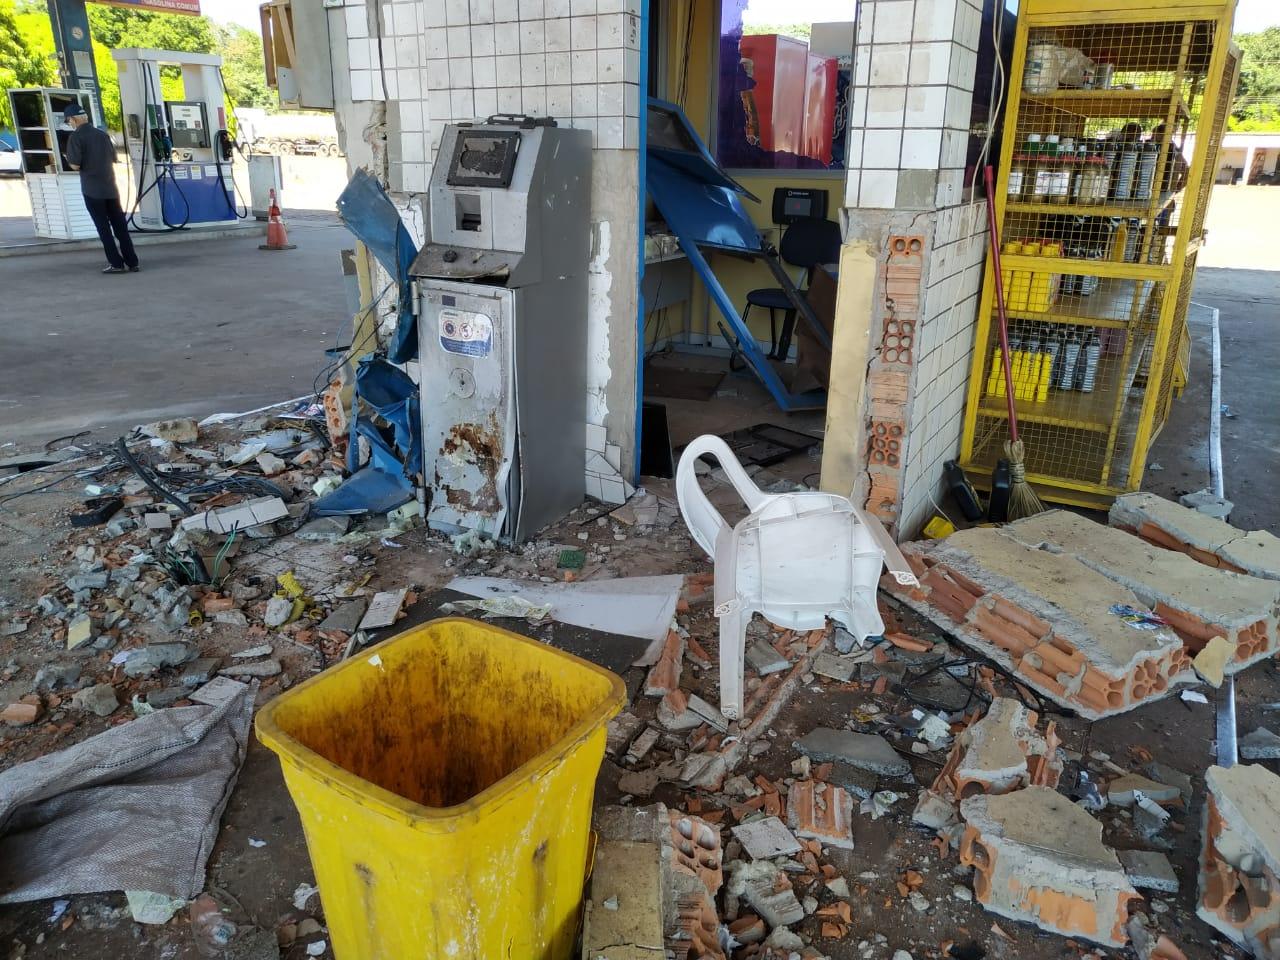 Bando usou dinamite para explodir cofre de posto em Teresina - Foto: Matheus Oliveira/Portal Meio Norte